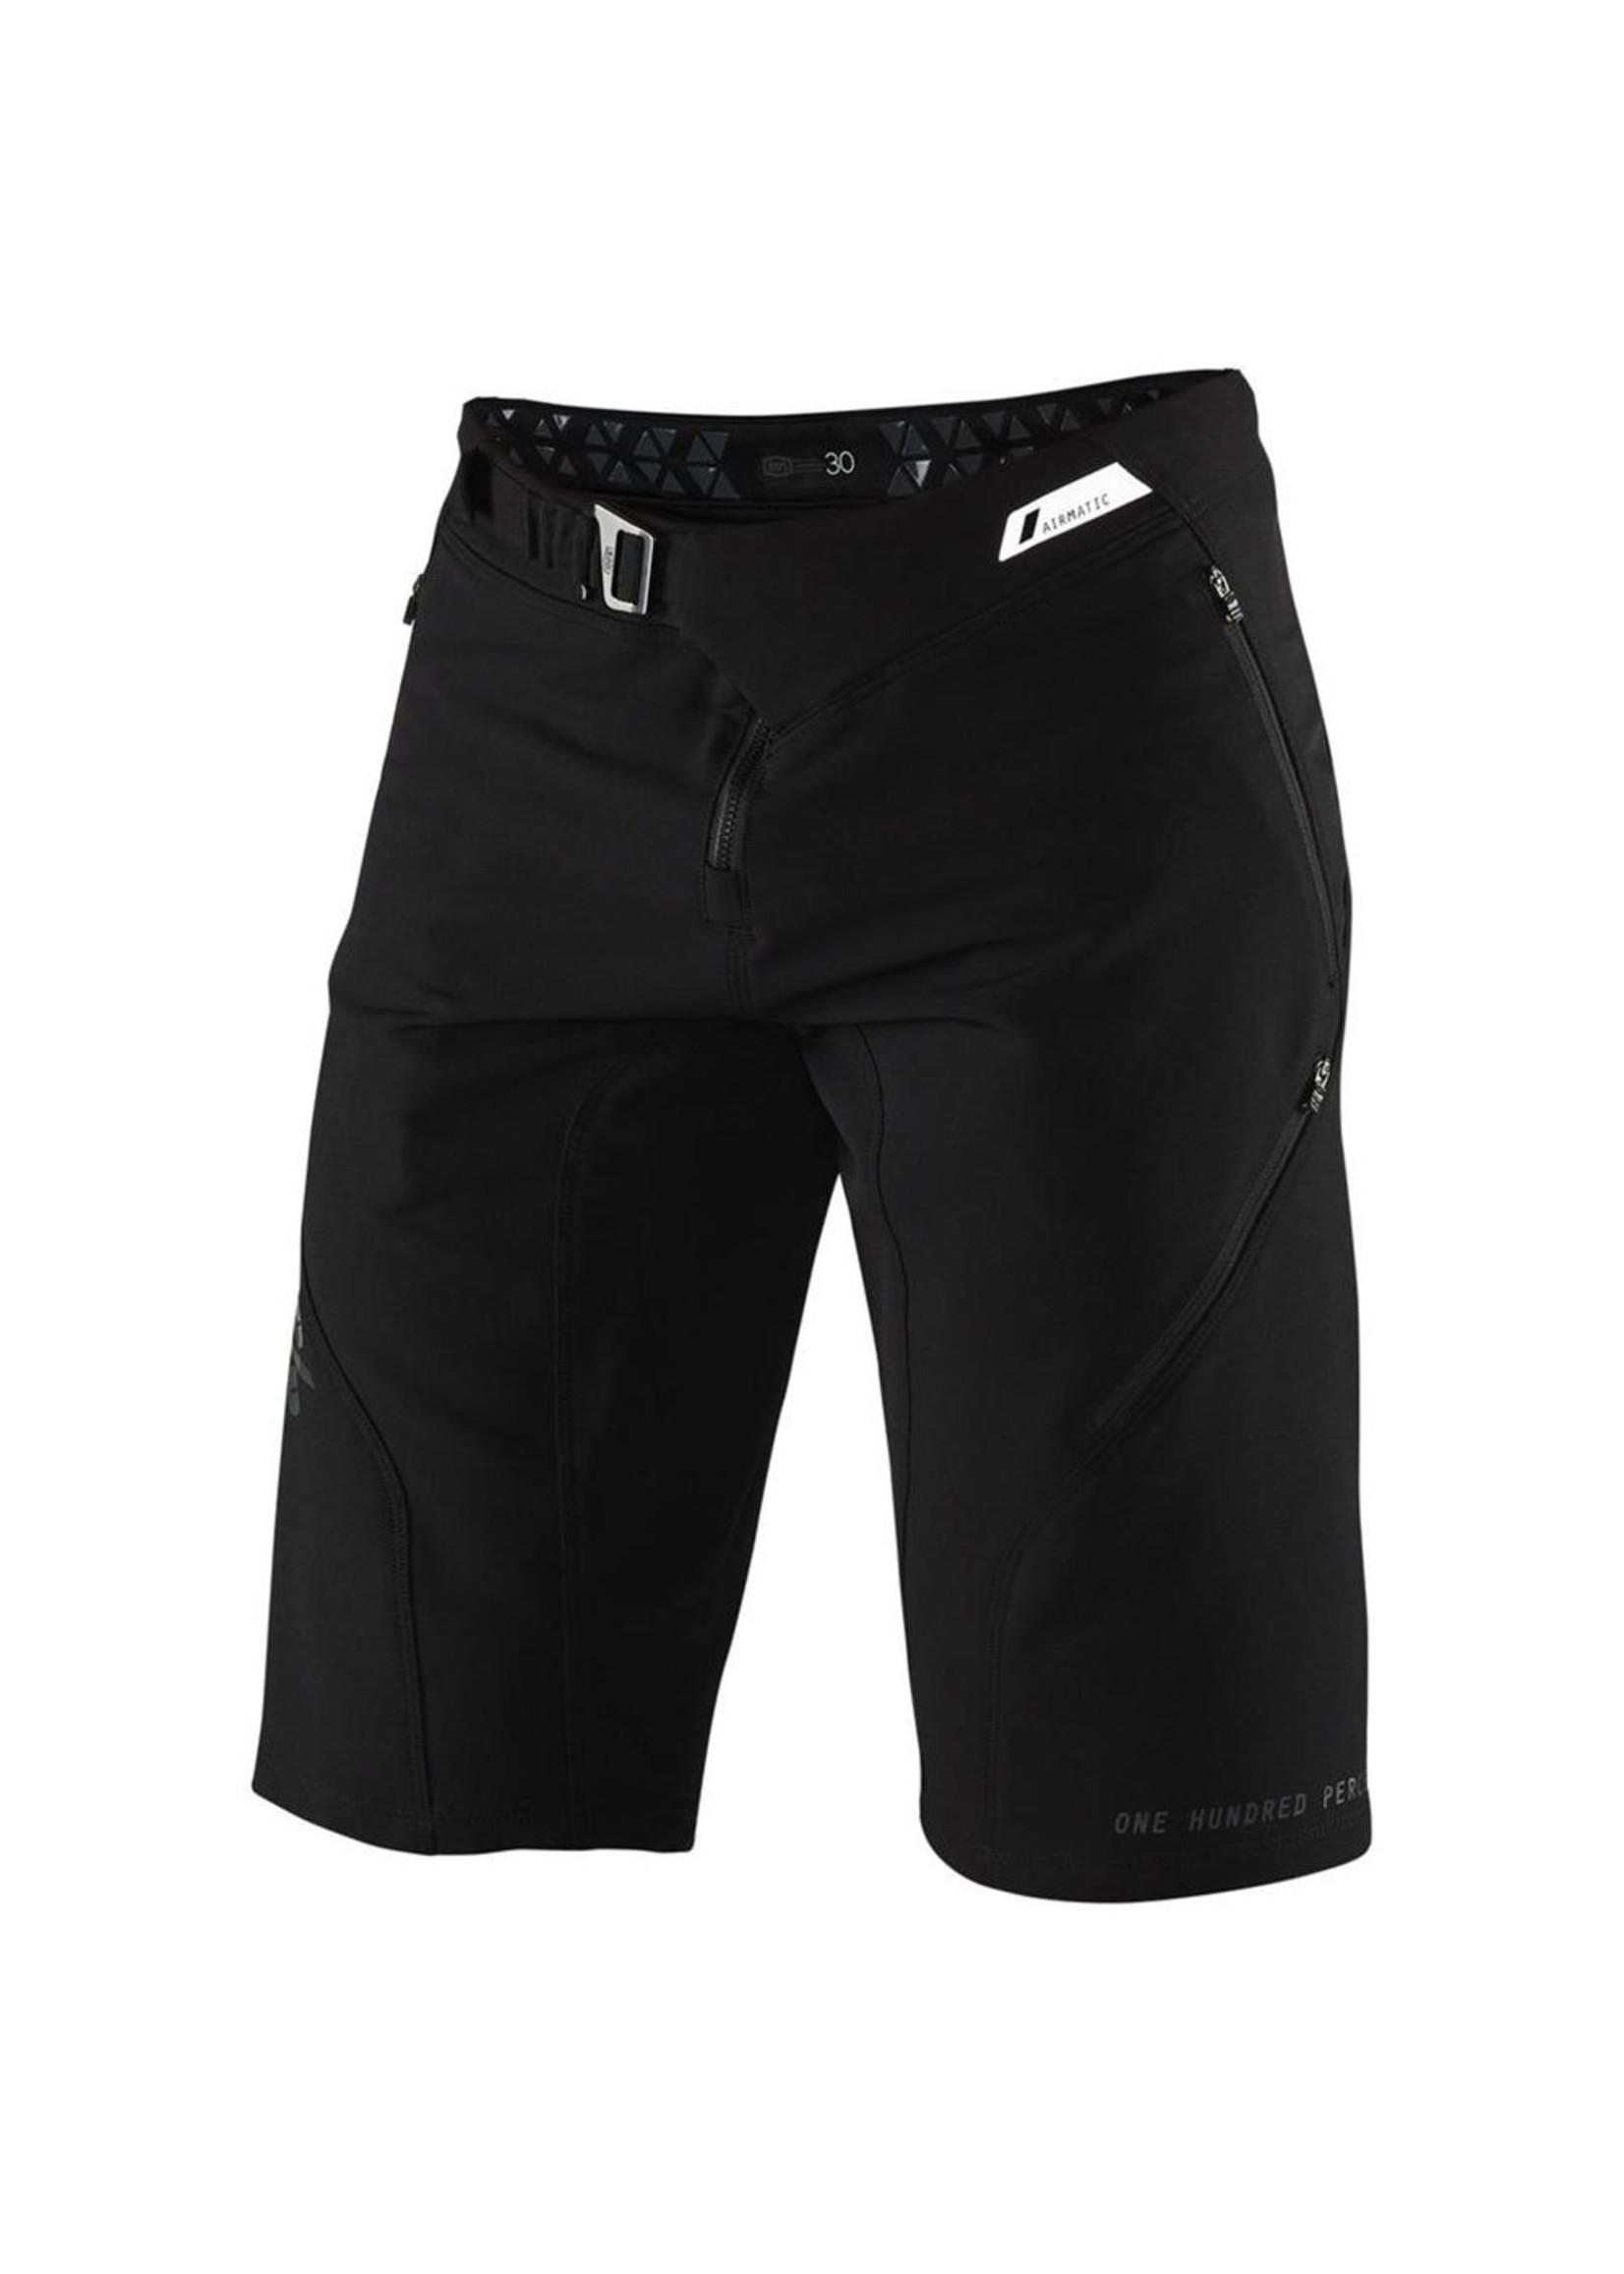 100% 100% AirMatic Men's MTB shorts